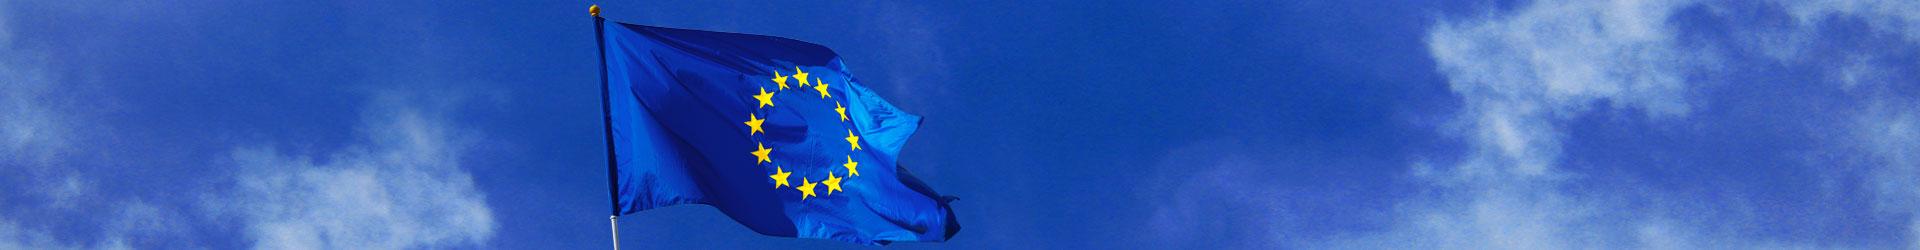 https://wegweiser-europapolitik.eu/wp-content/uploads/2016/04/EU-Flagge.jpg